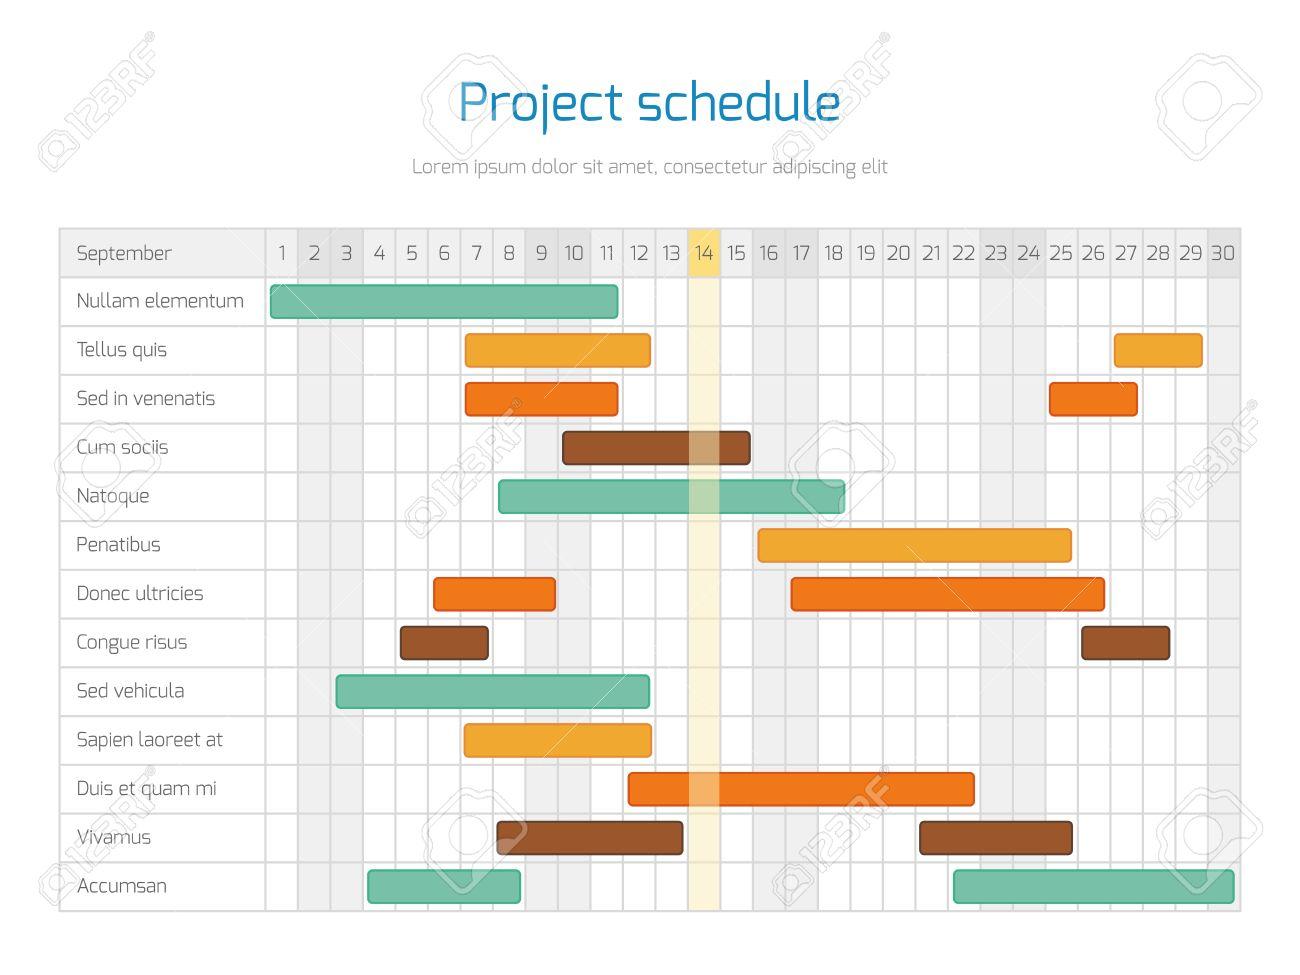 Project schedule chart overview planning timeline vector diagram project schedule chart overview planning timeline vector diagram project infographic business plan illustration stock altavistaventures Images